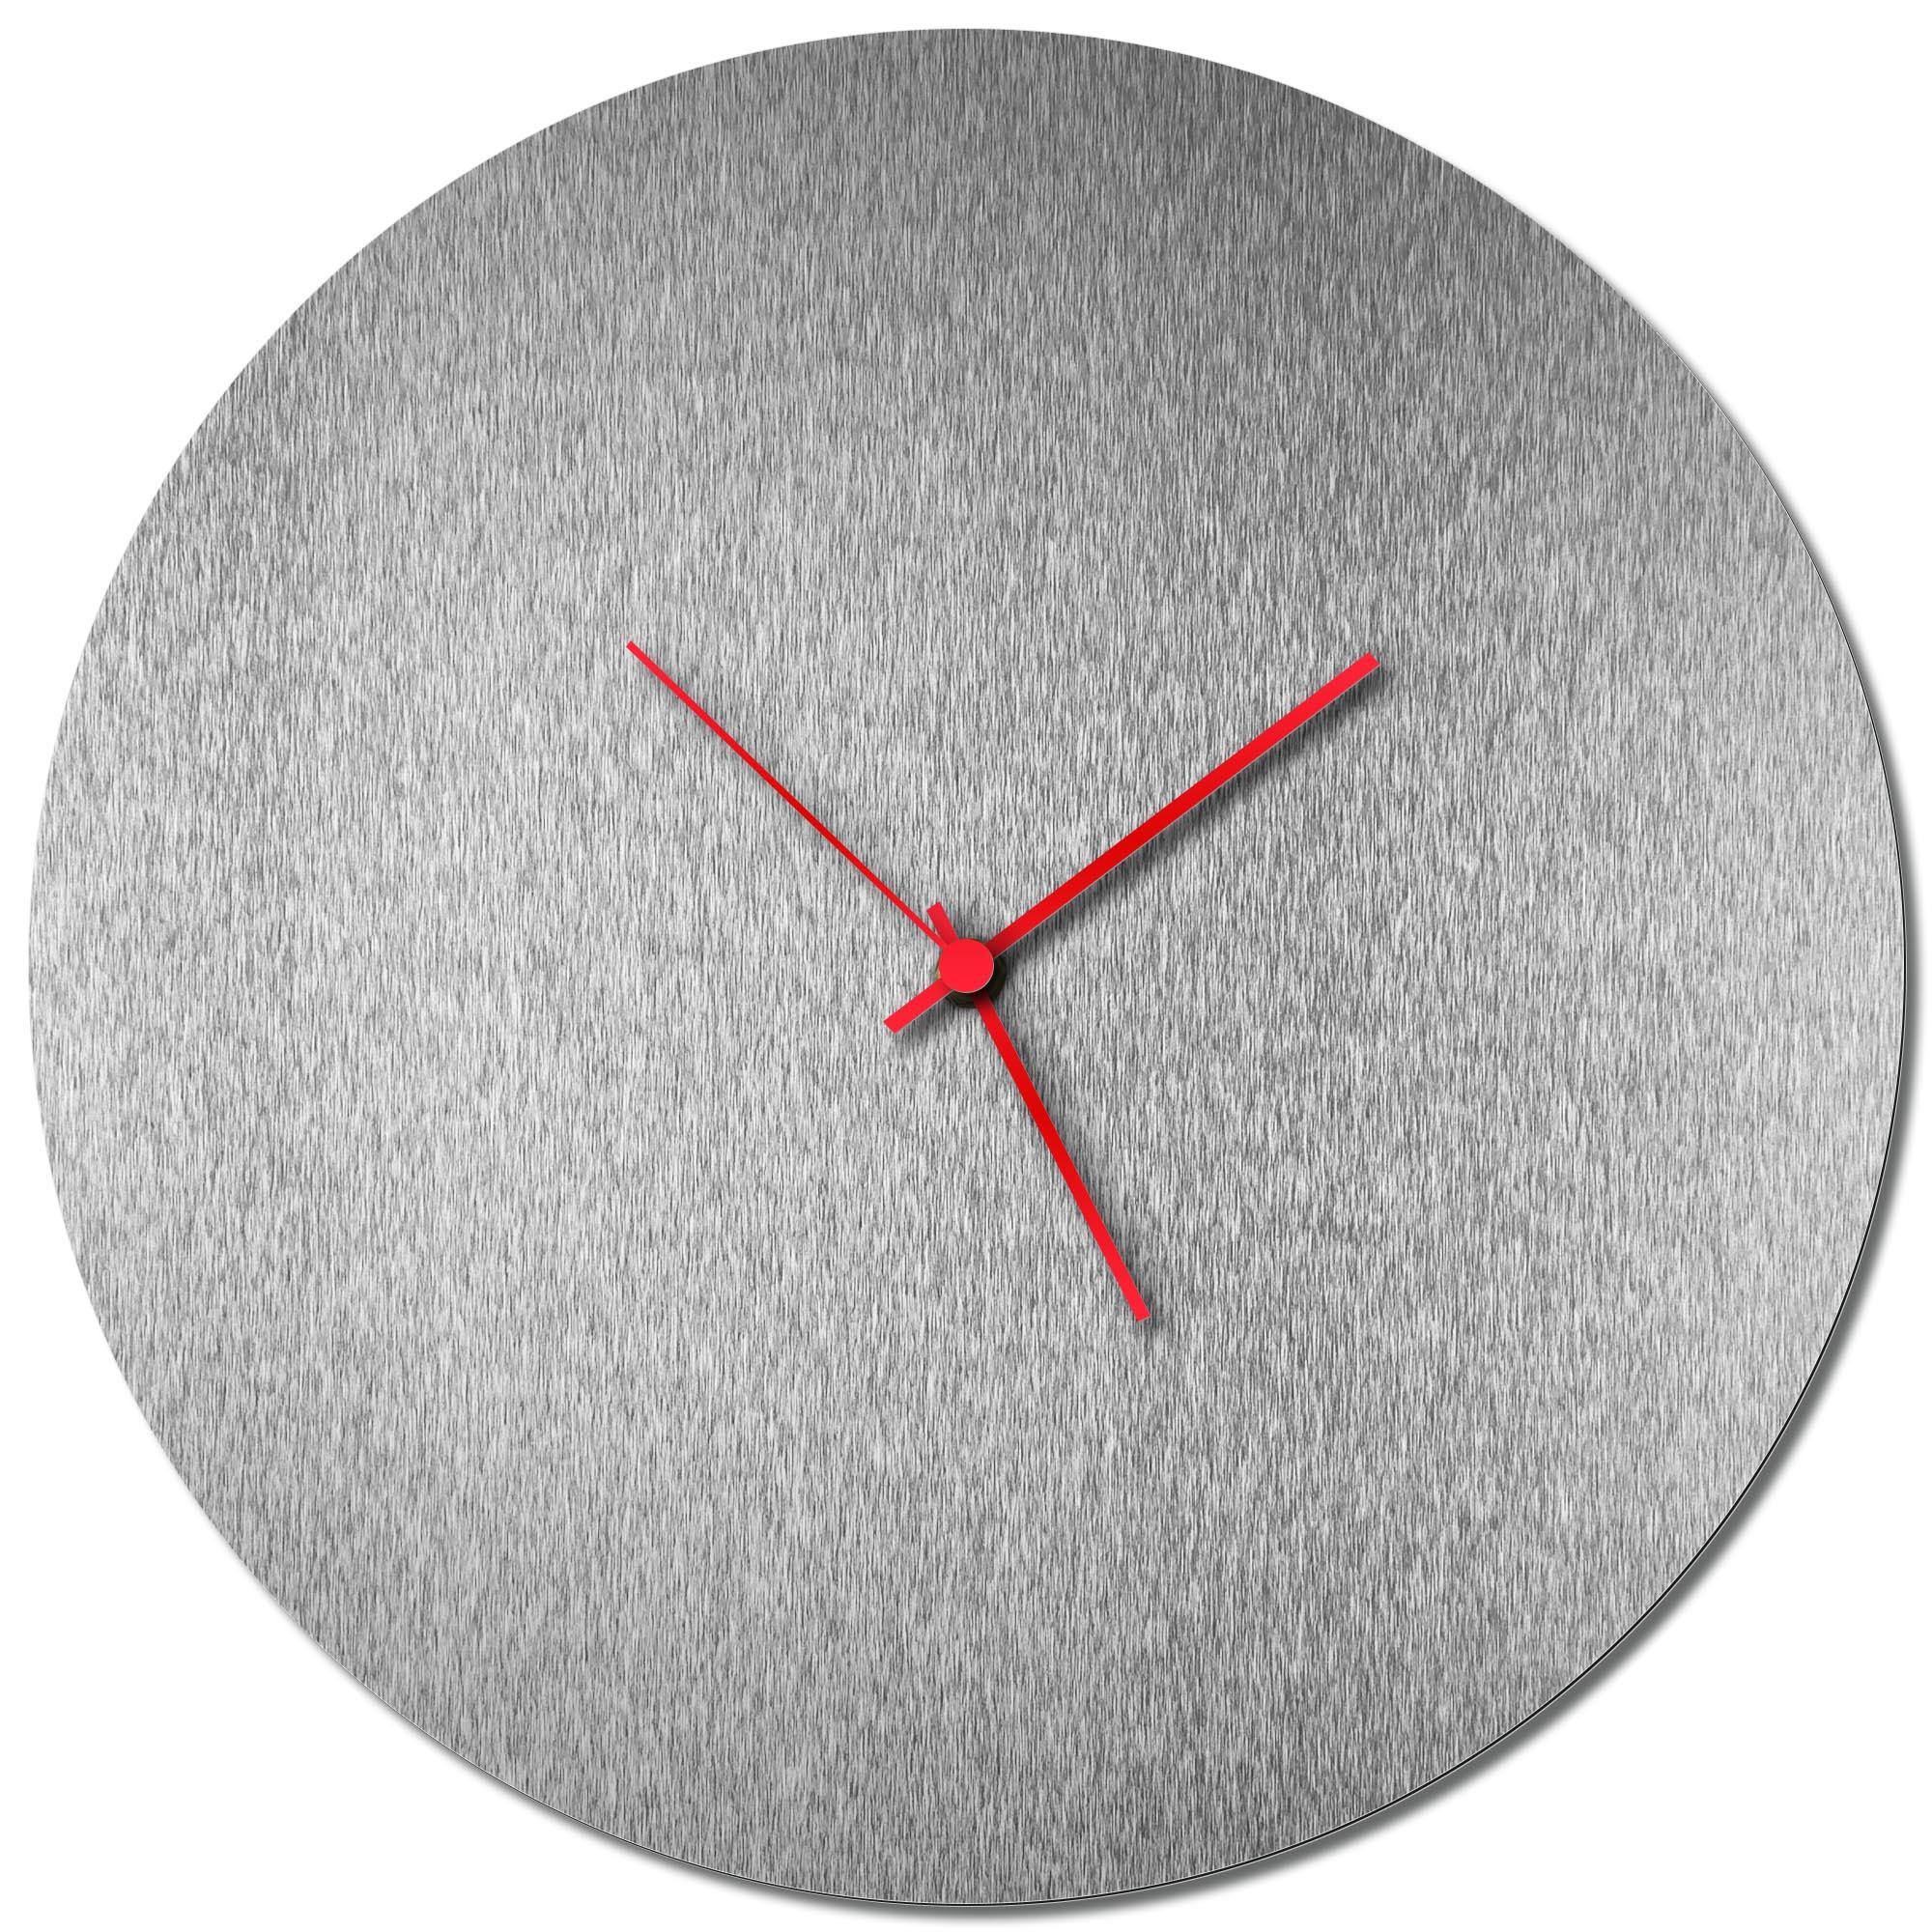 Adam Schwoeppe 'Silversmith Circle Clock Red' Midcentury Modern Style Wall Clock